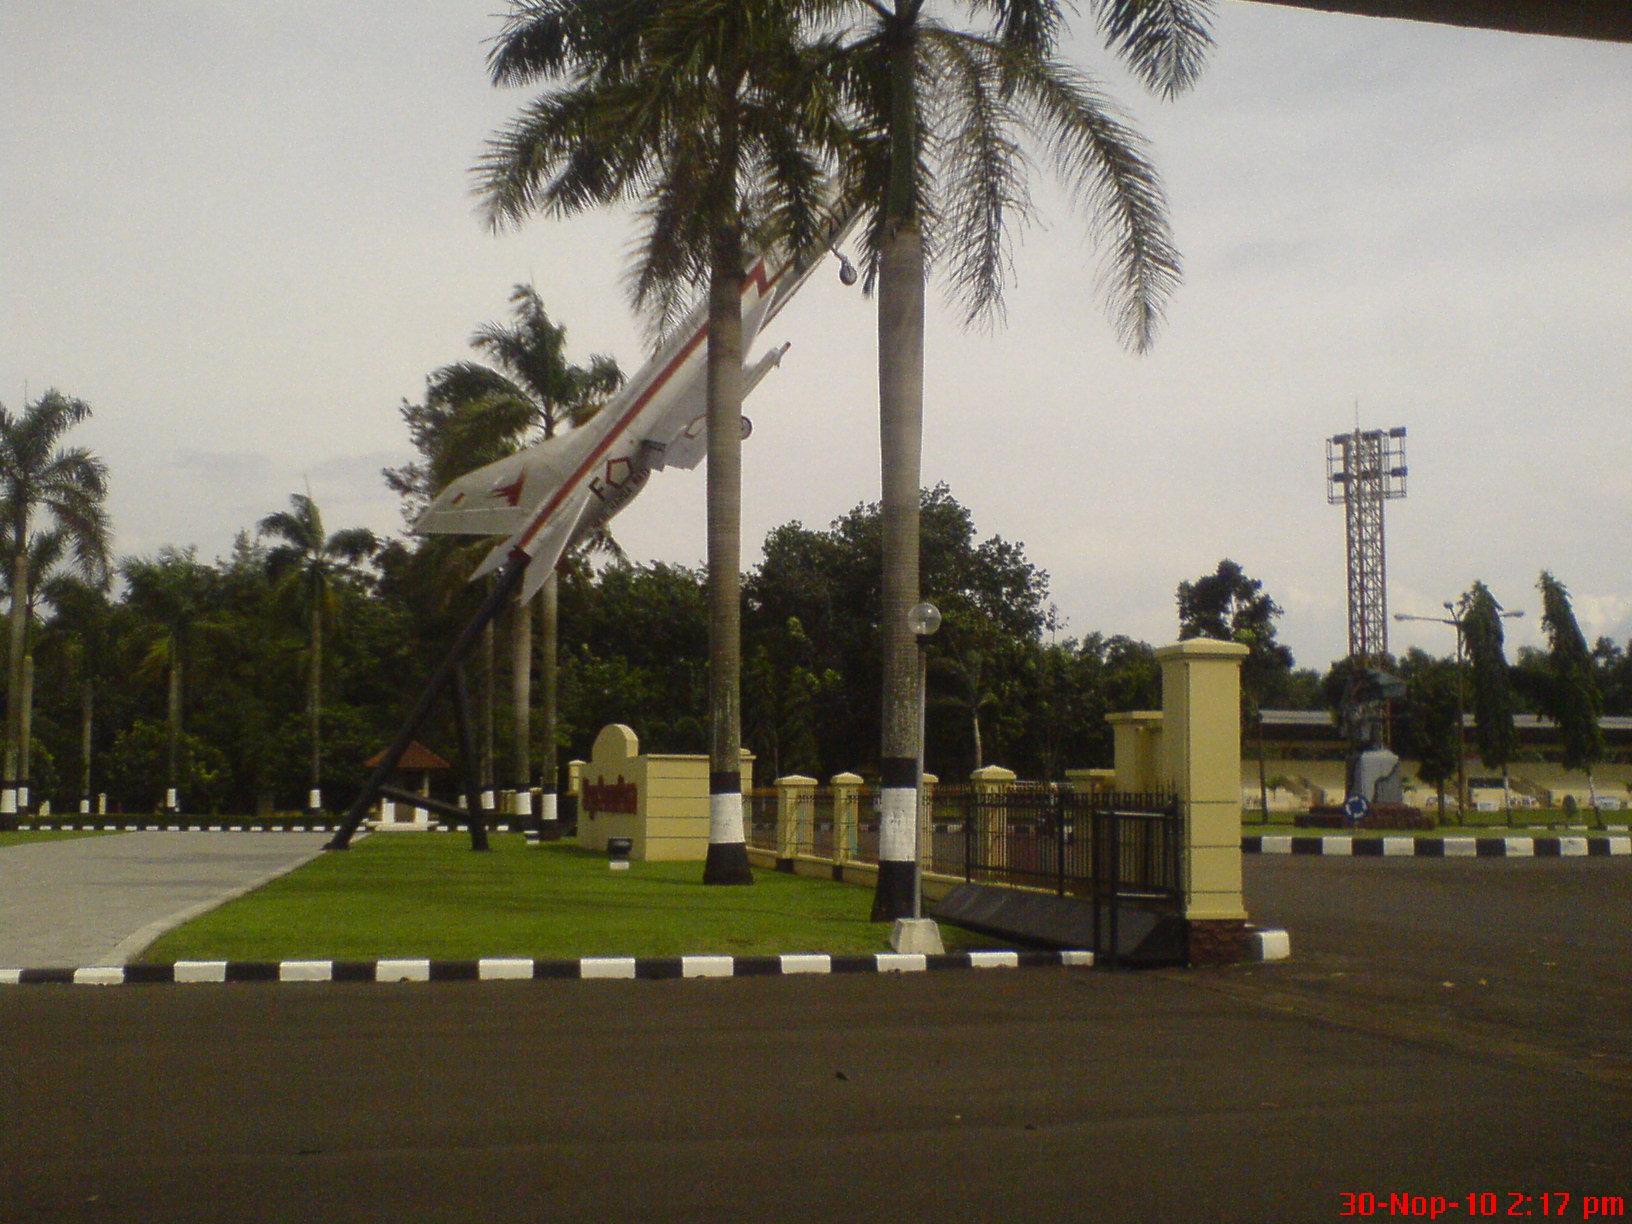 File:Patung Pesawat - panoramio.jpg